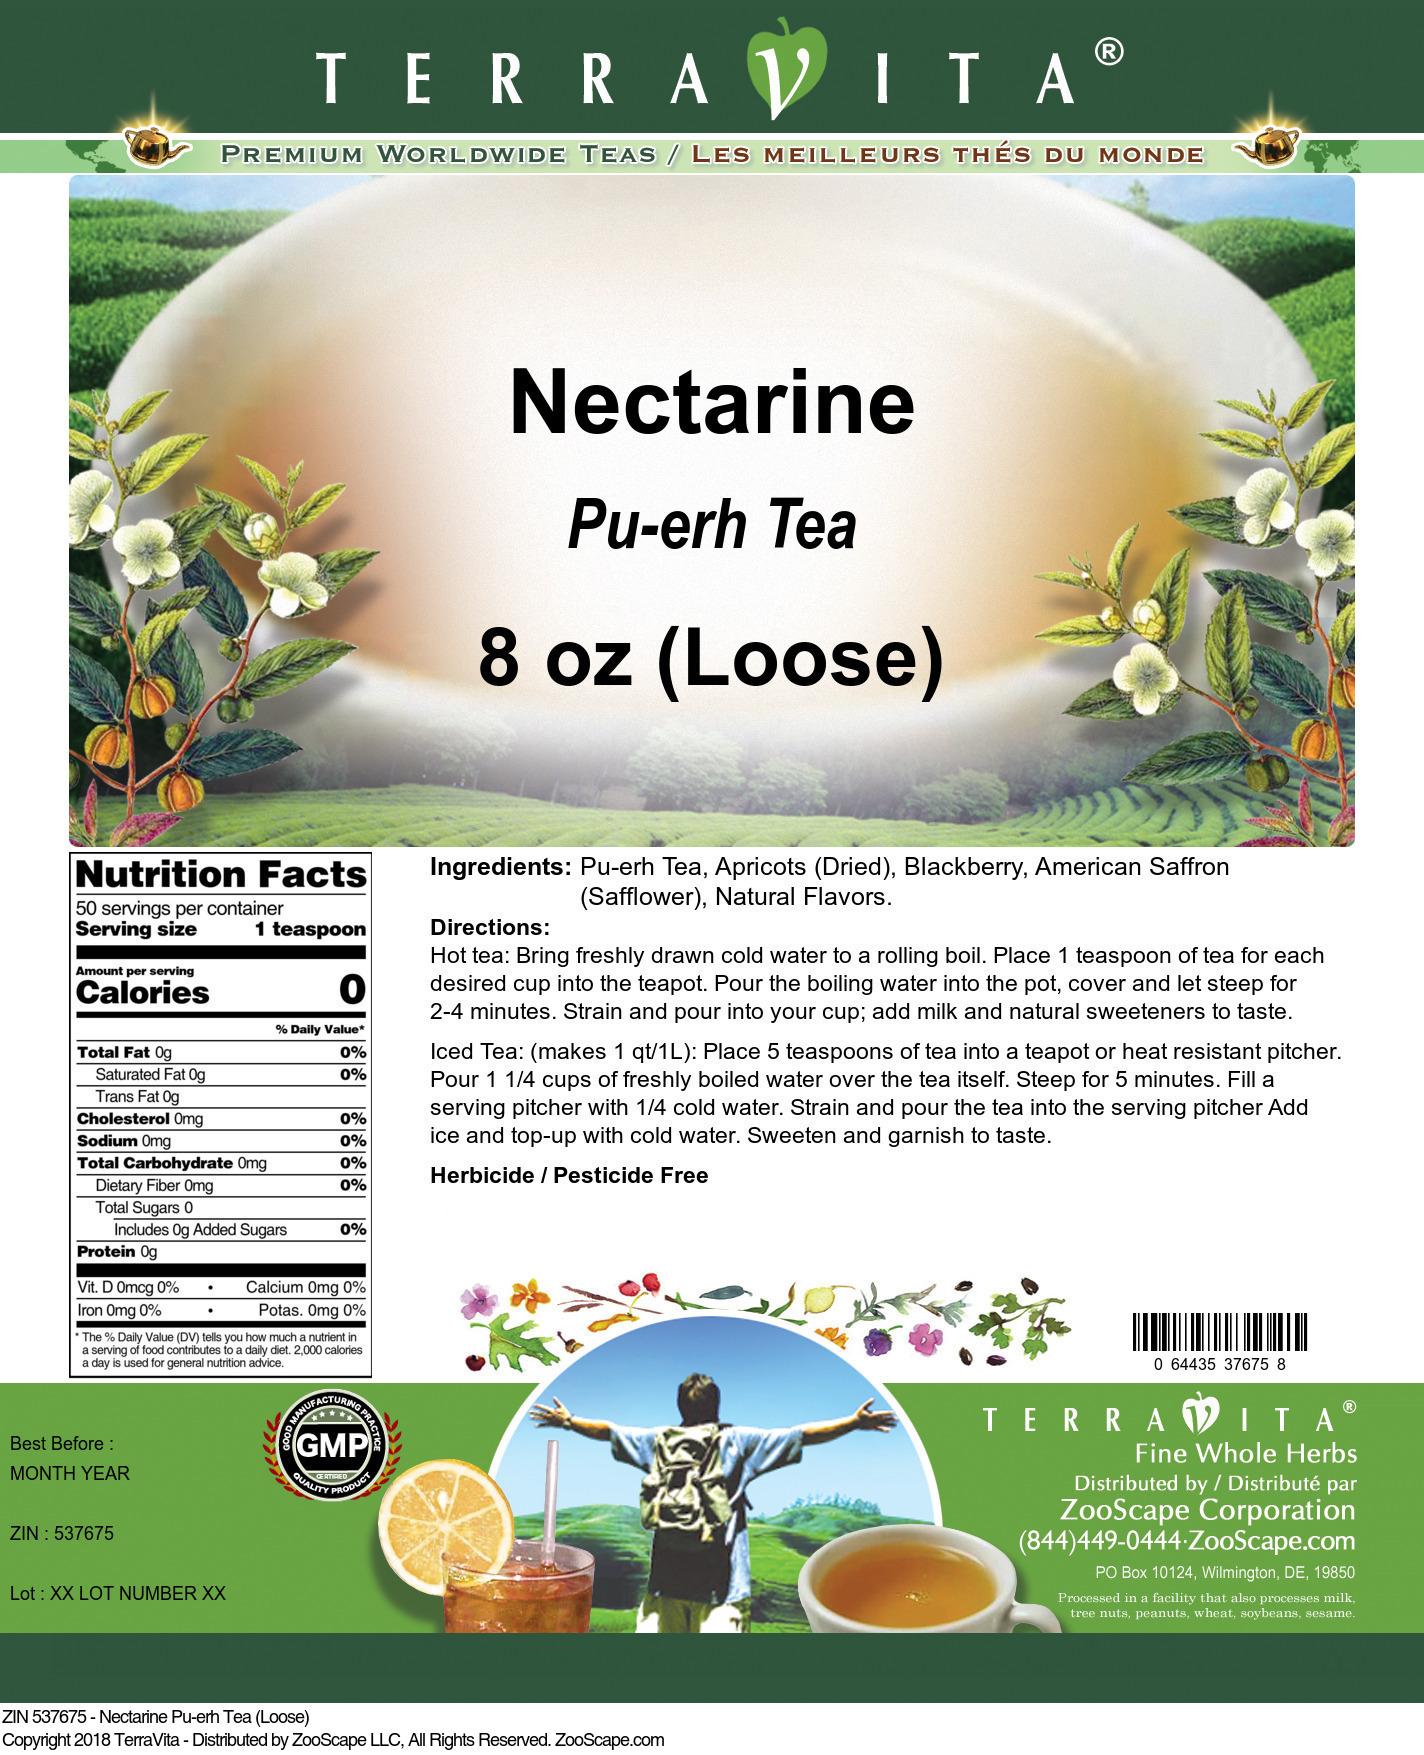 Nectarine Pu-erh Tea (Loose)